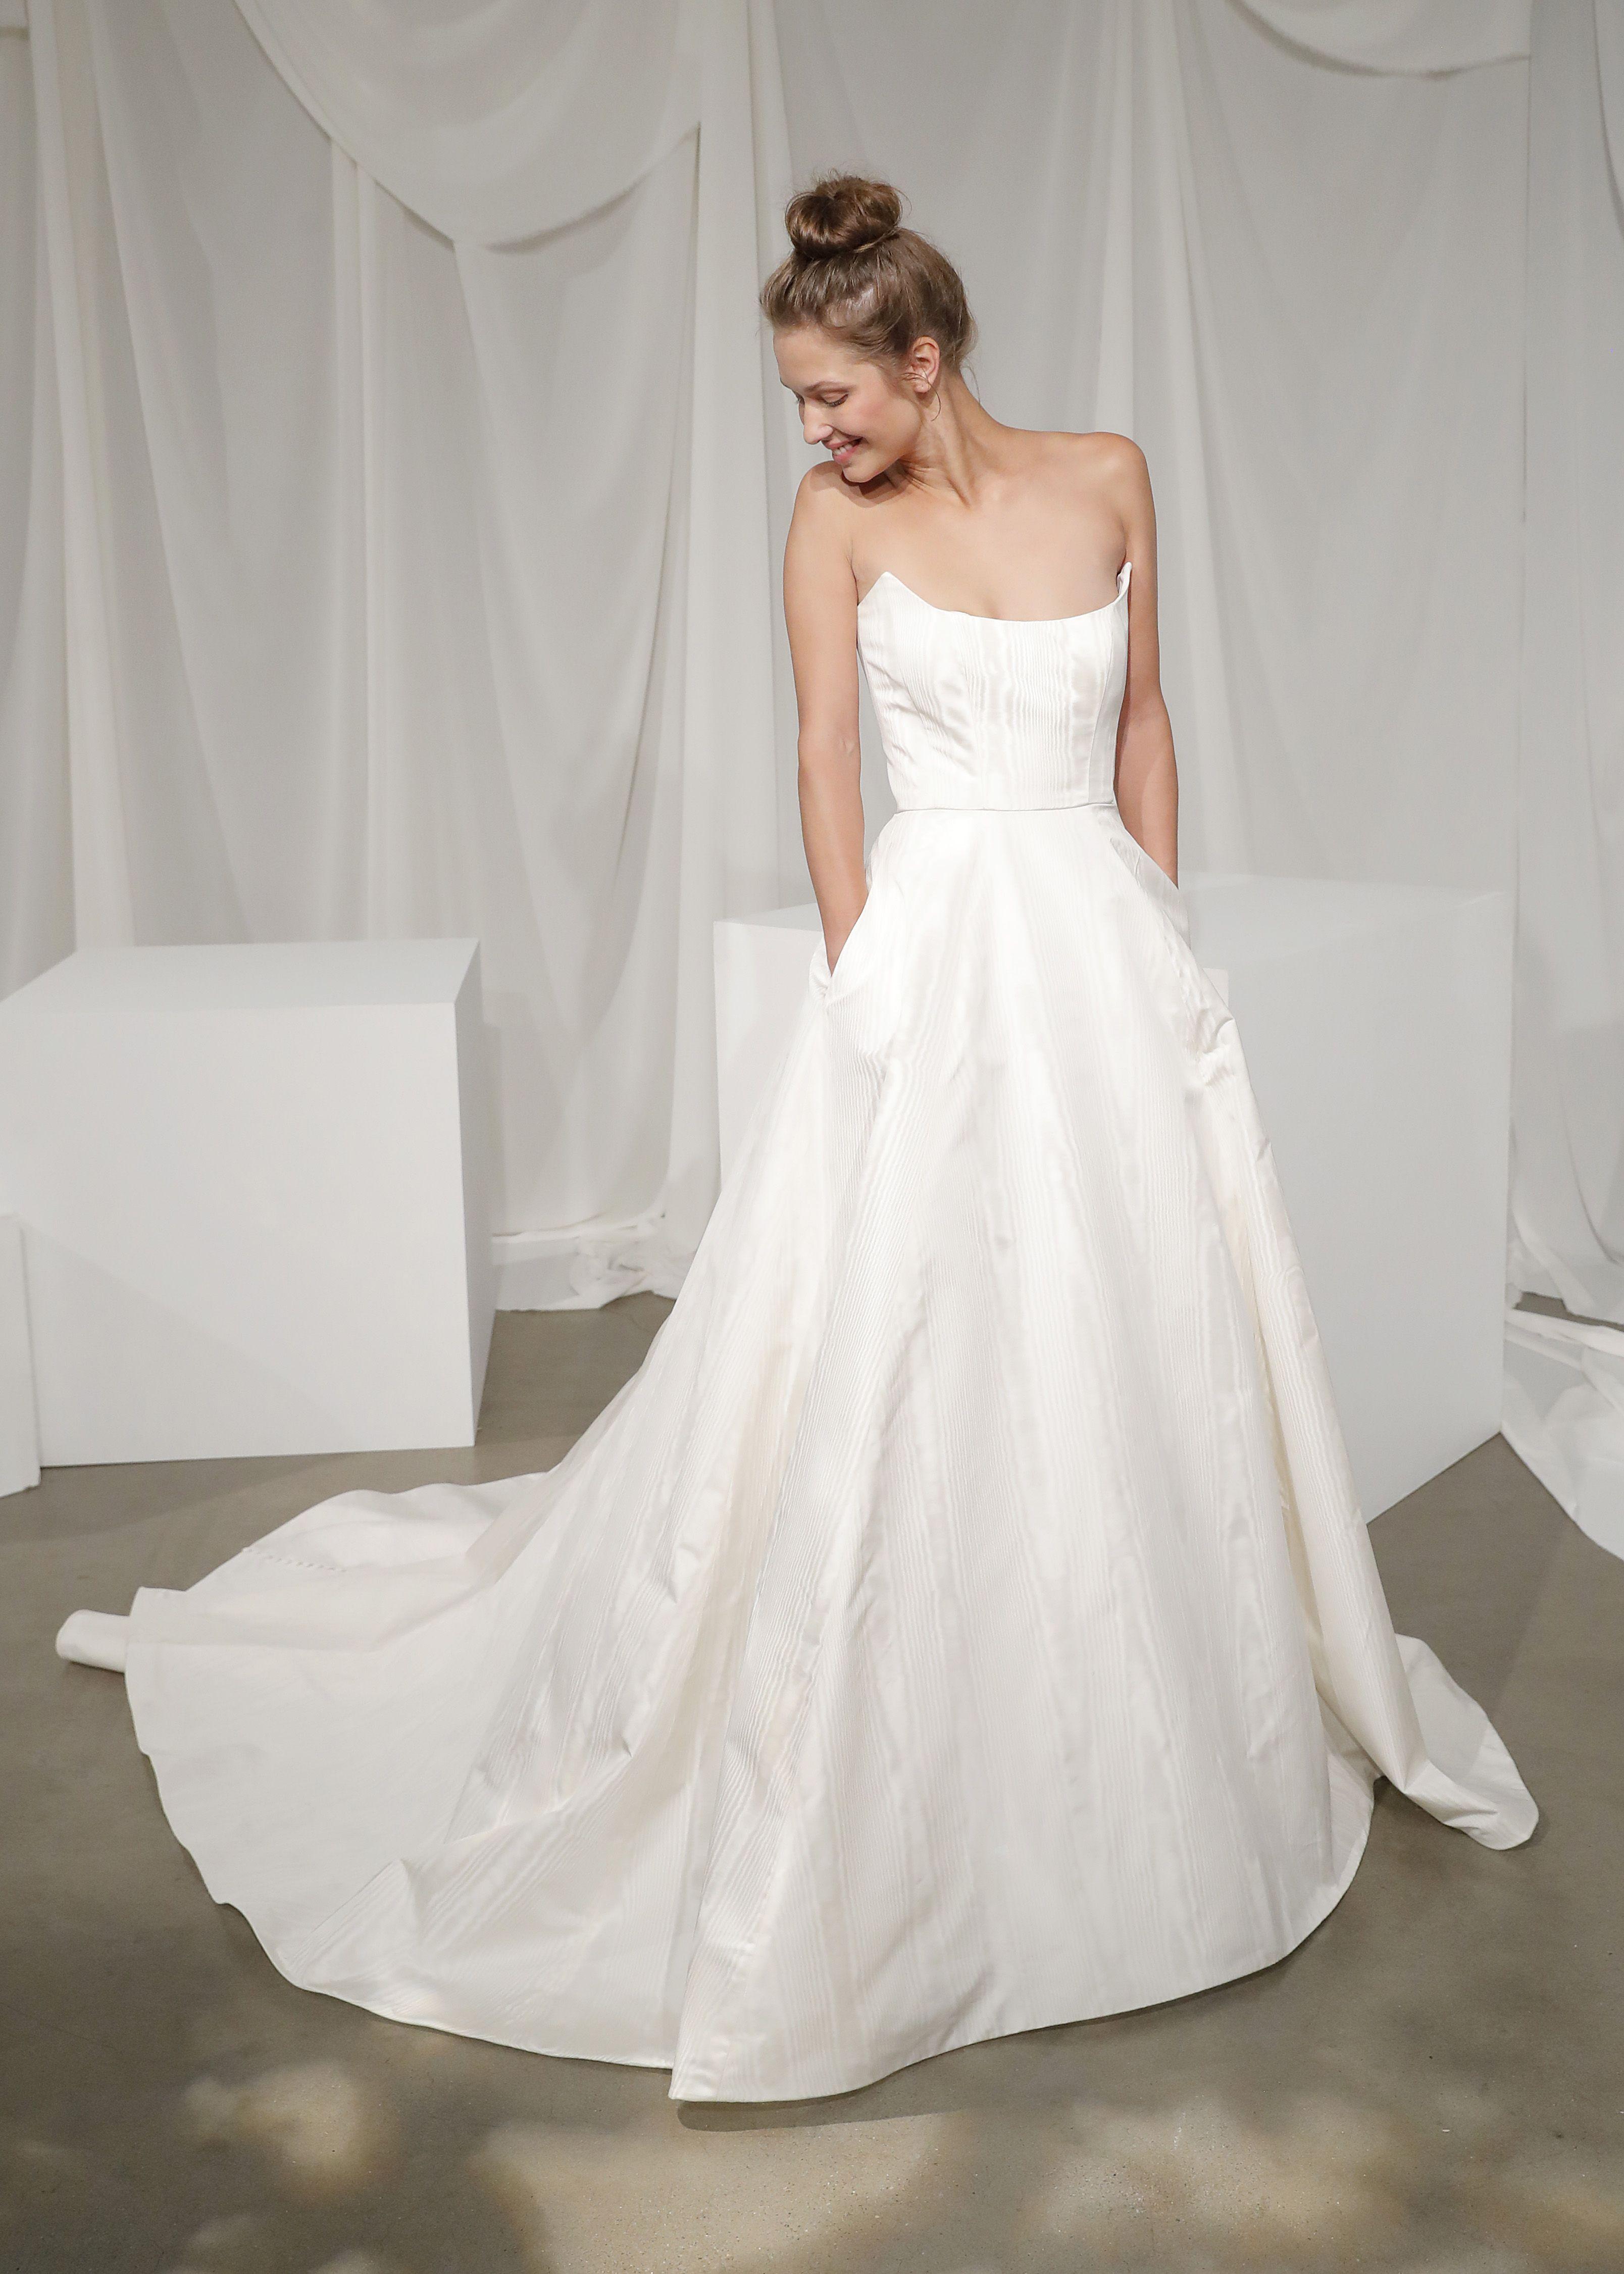 Clotilde By Amsale Amsale Wedding Dress Amsale Bridal Wedding Dresses Unique